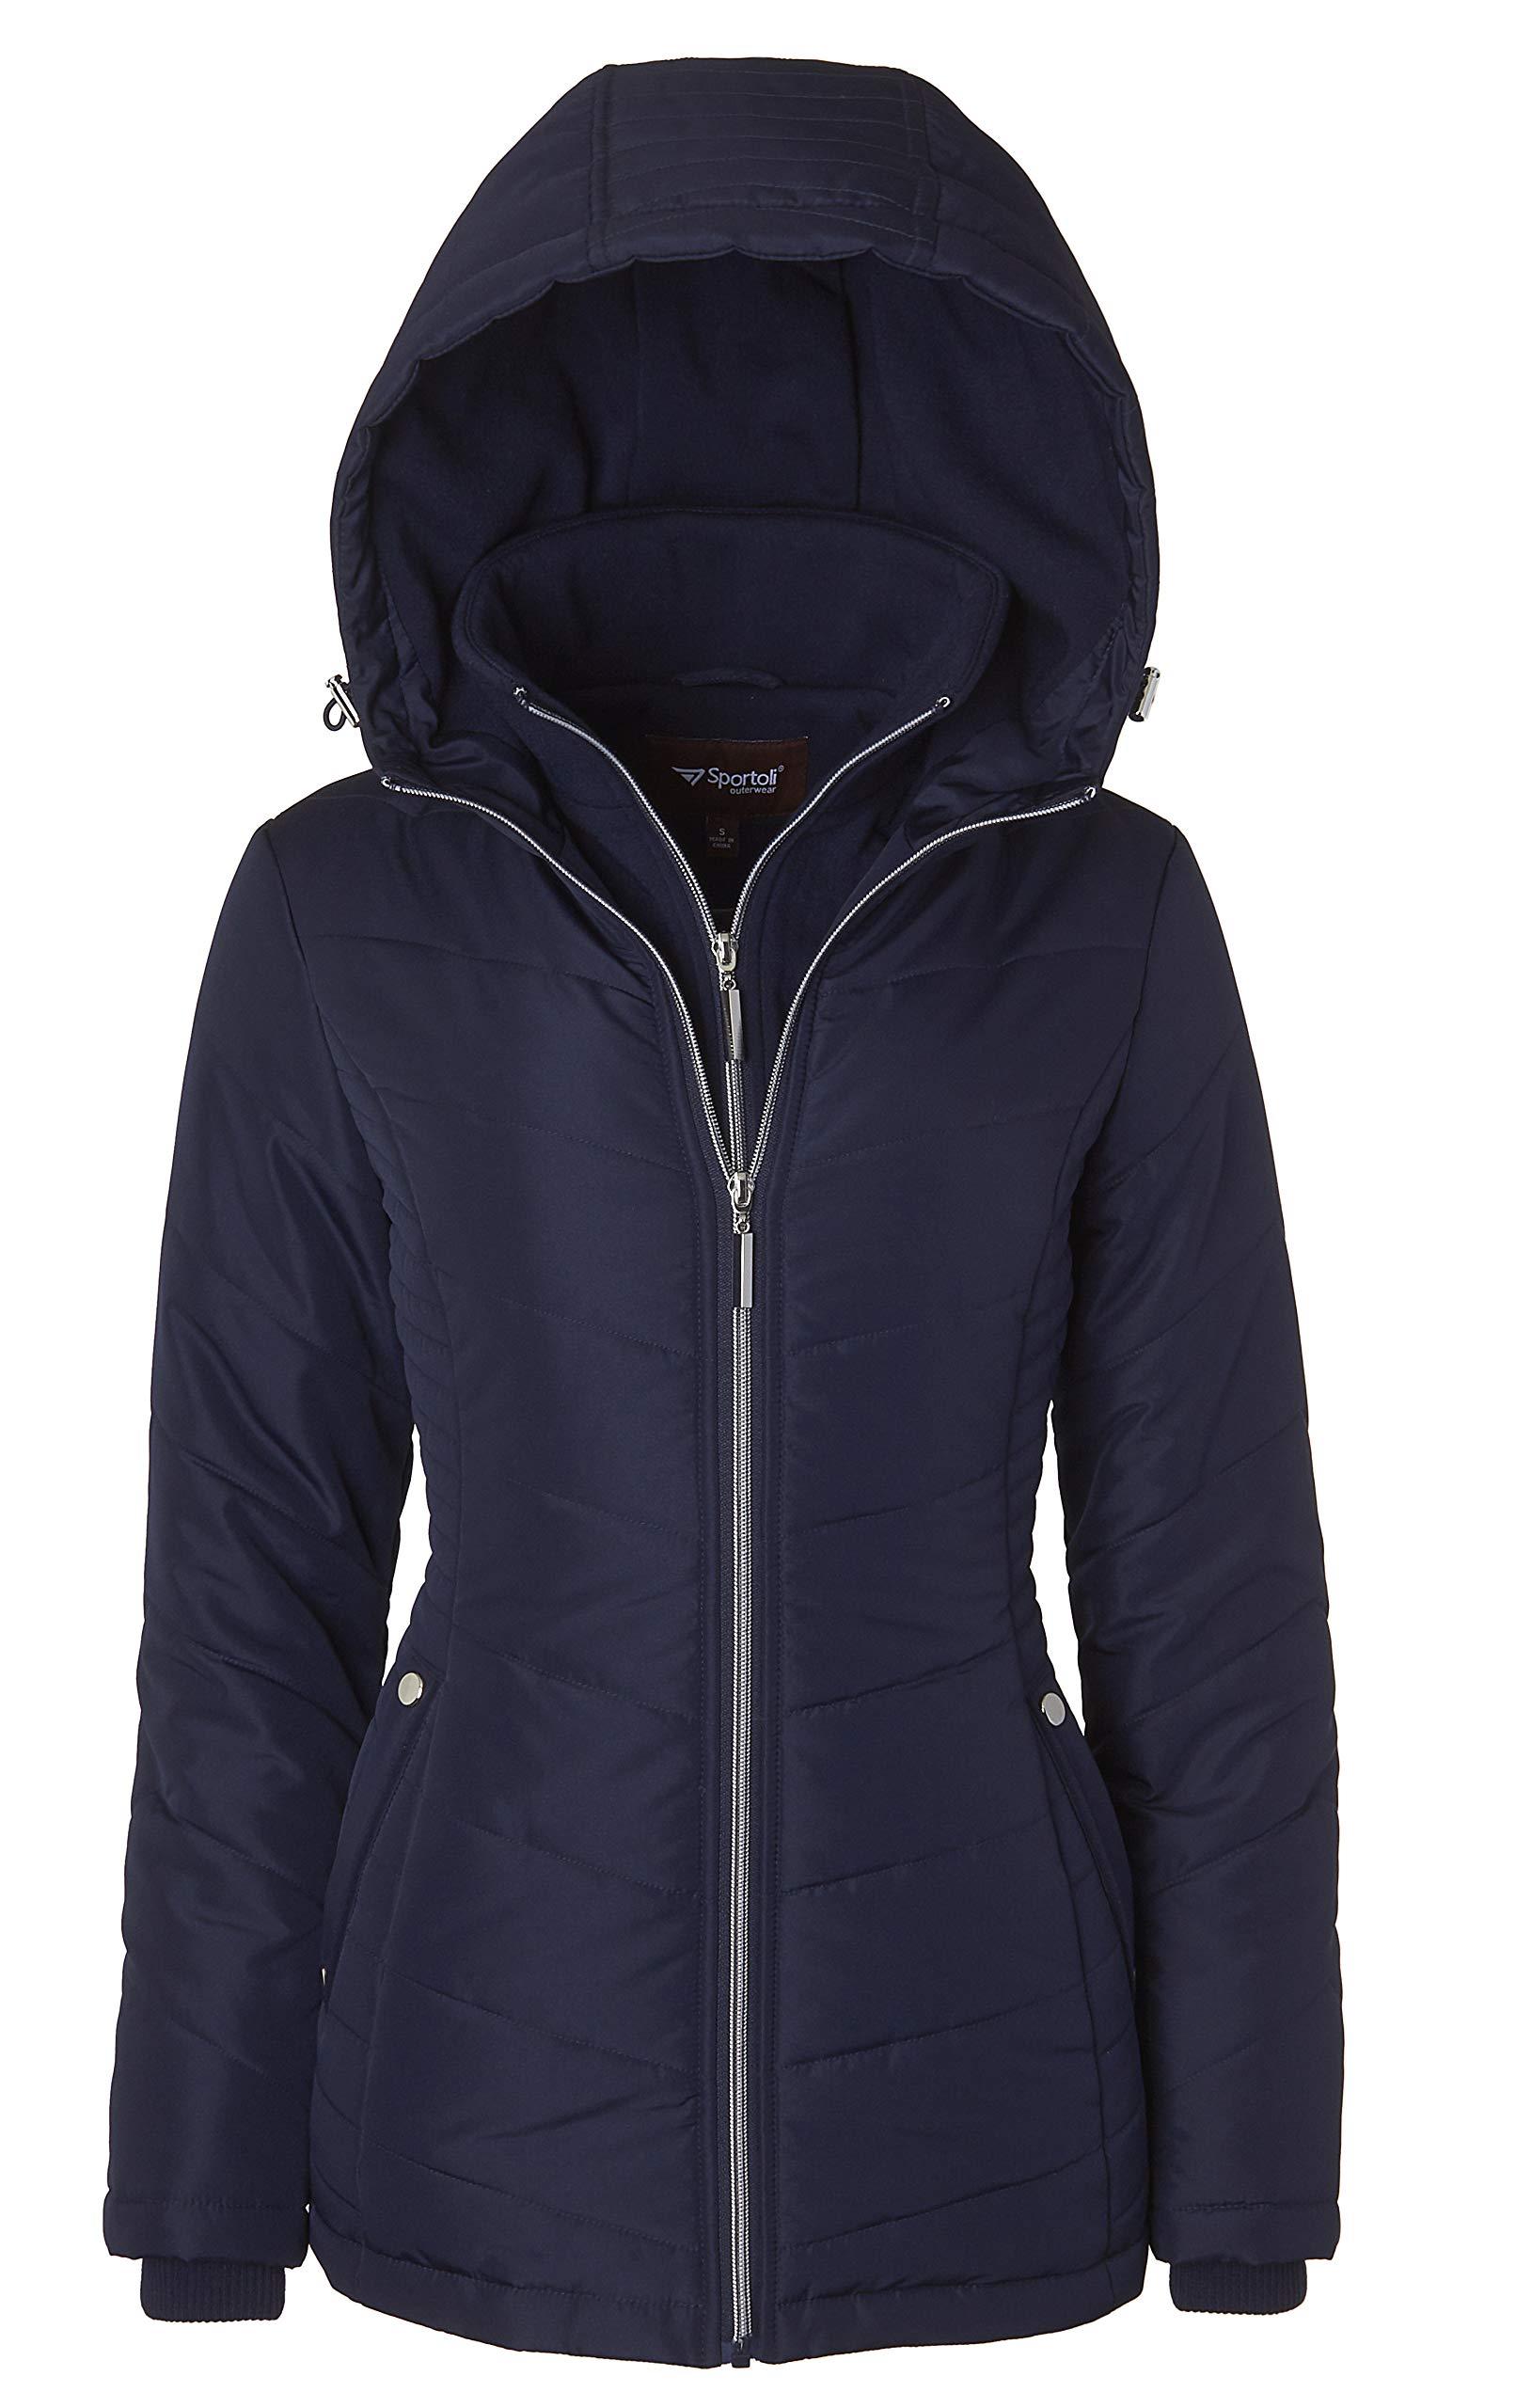 Women's Down Alternative Quilted Midlength Vestee Puffer Jacket Fleece Hood - Stormy Night (Medium)